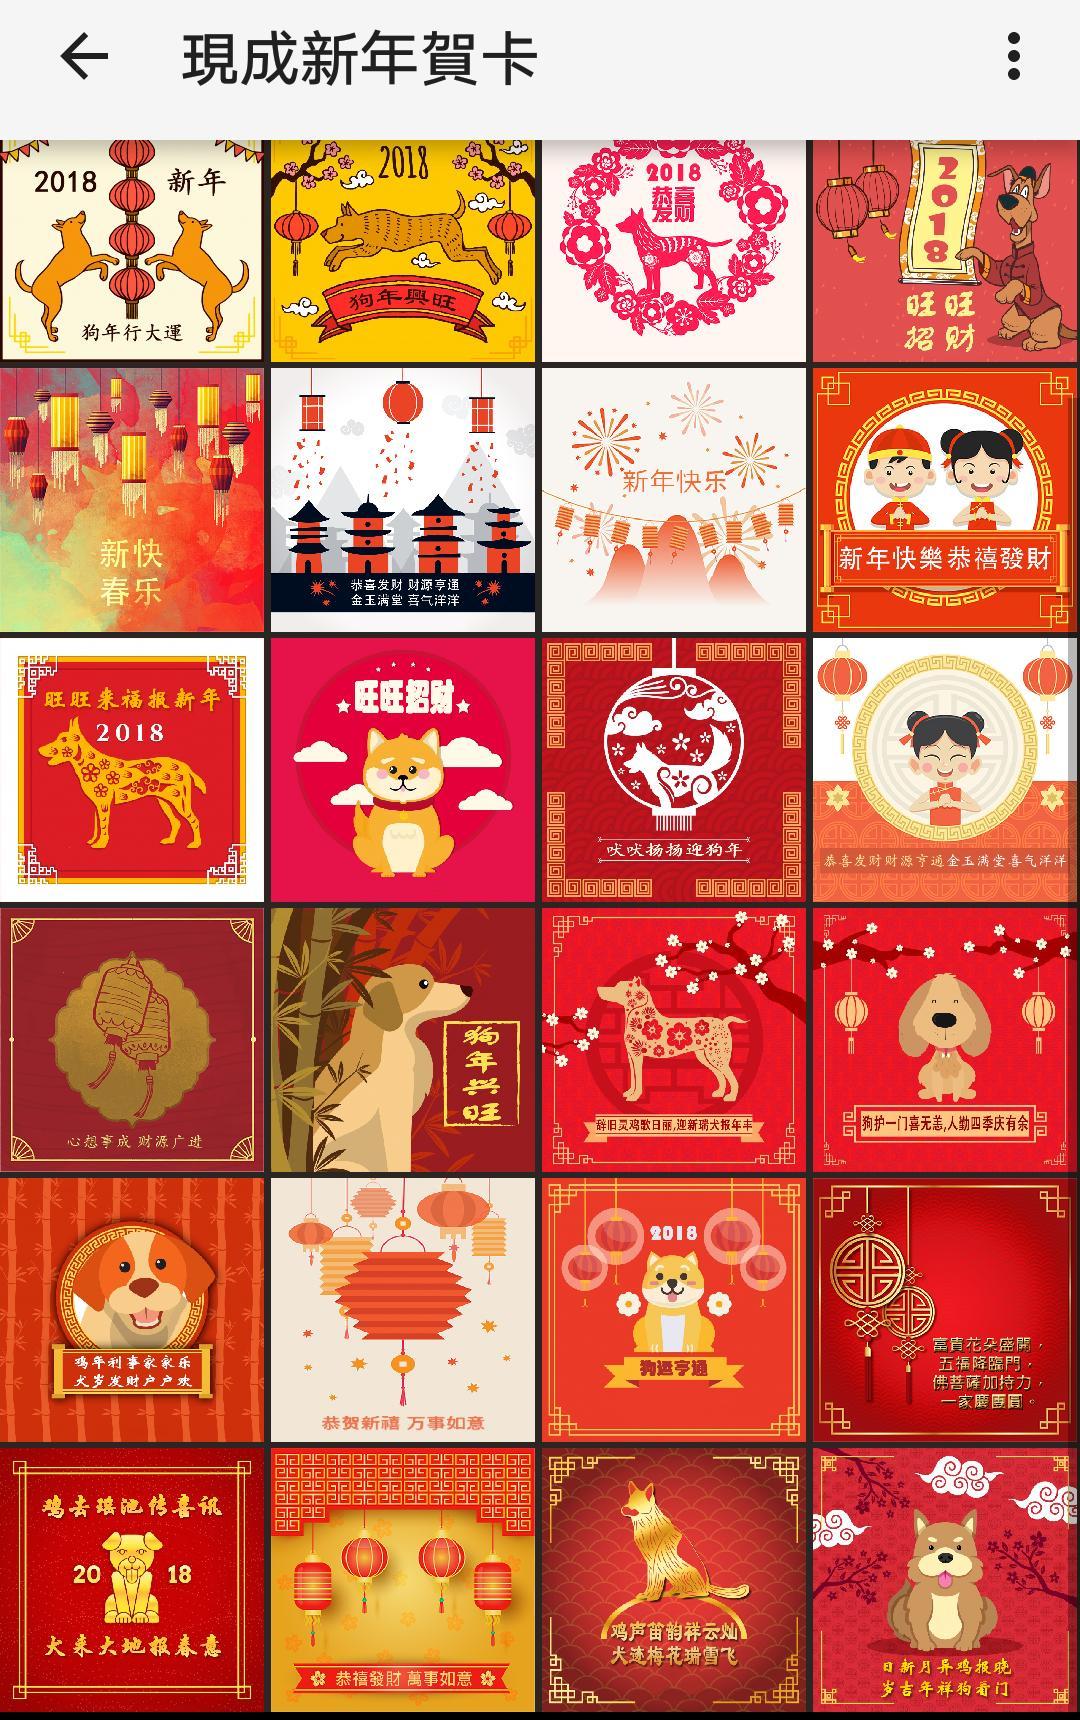 農曆新年賀卡 poster